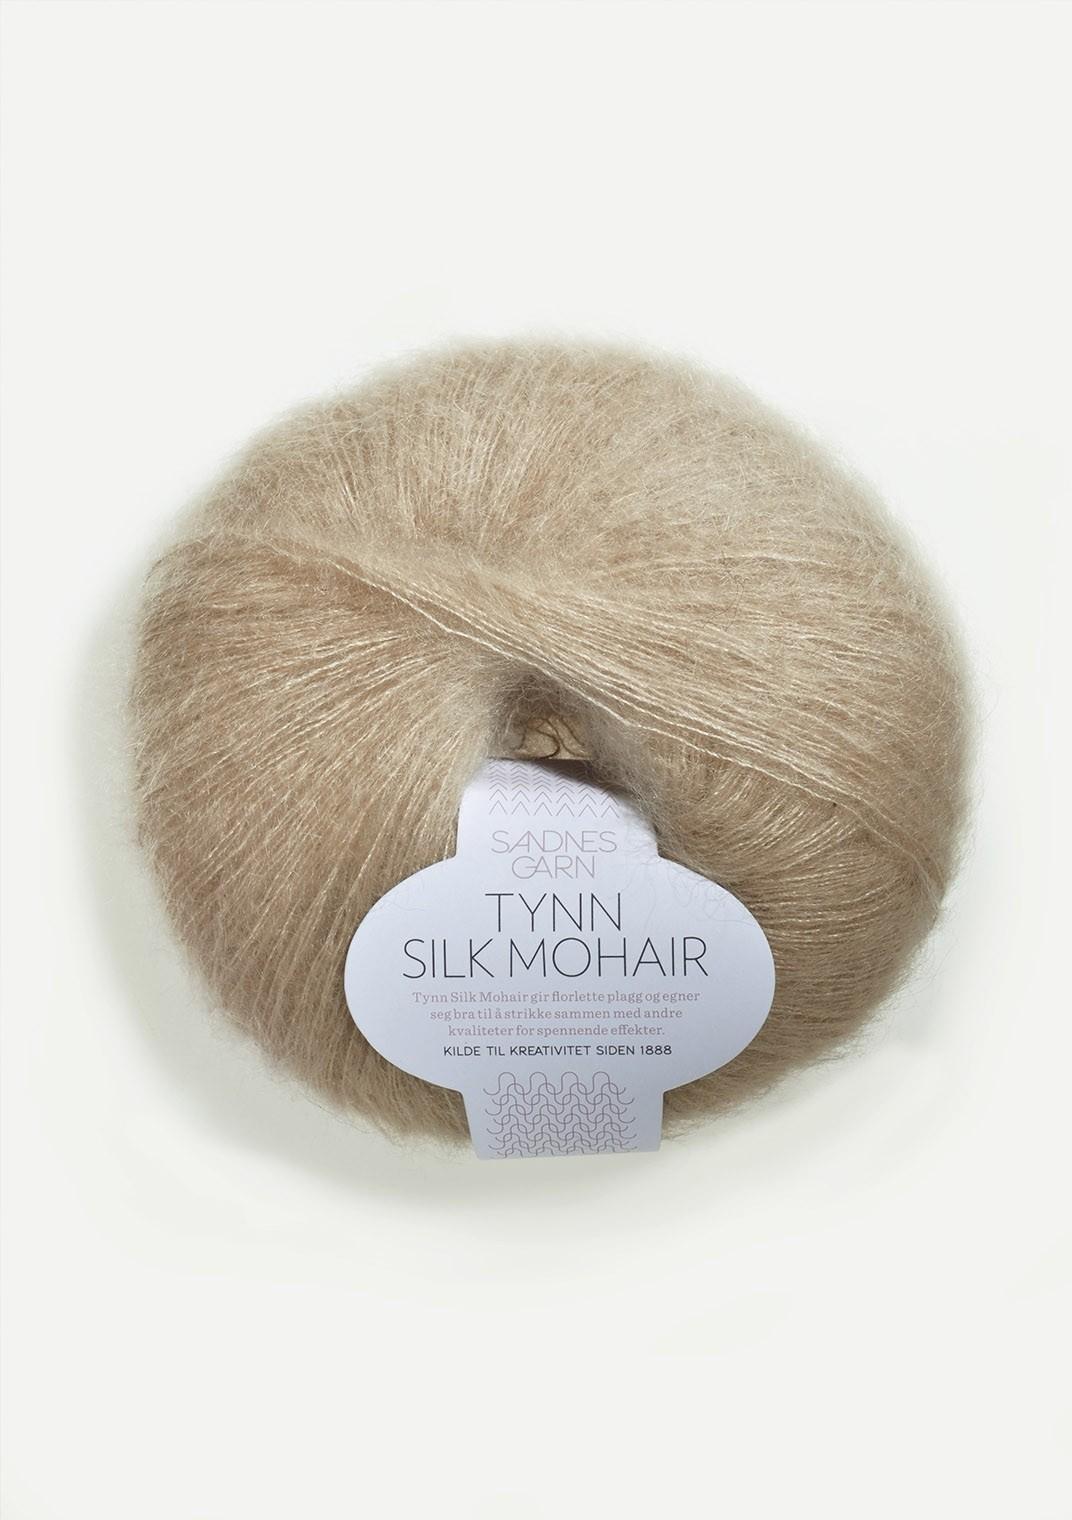 Sandnes 3021 lys beige Tynn Silk Mohair